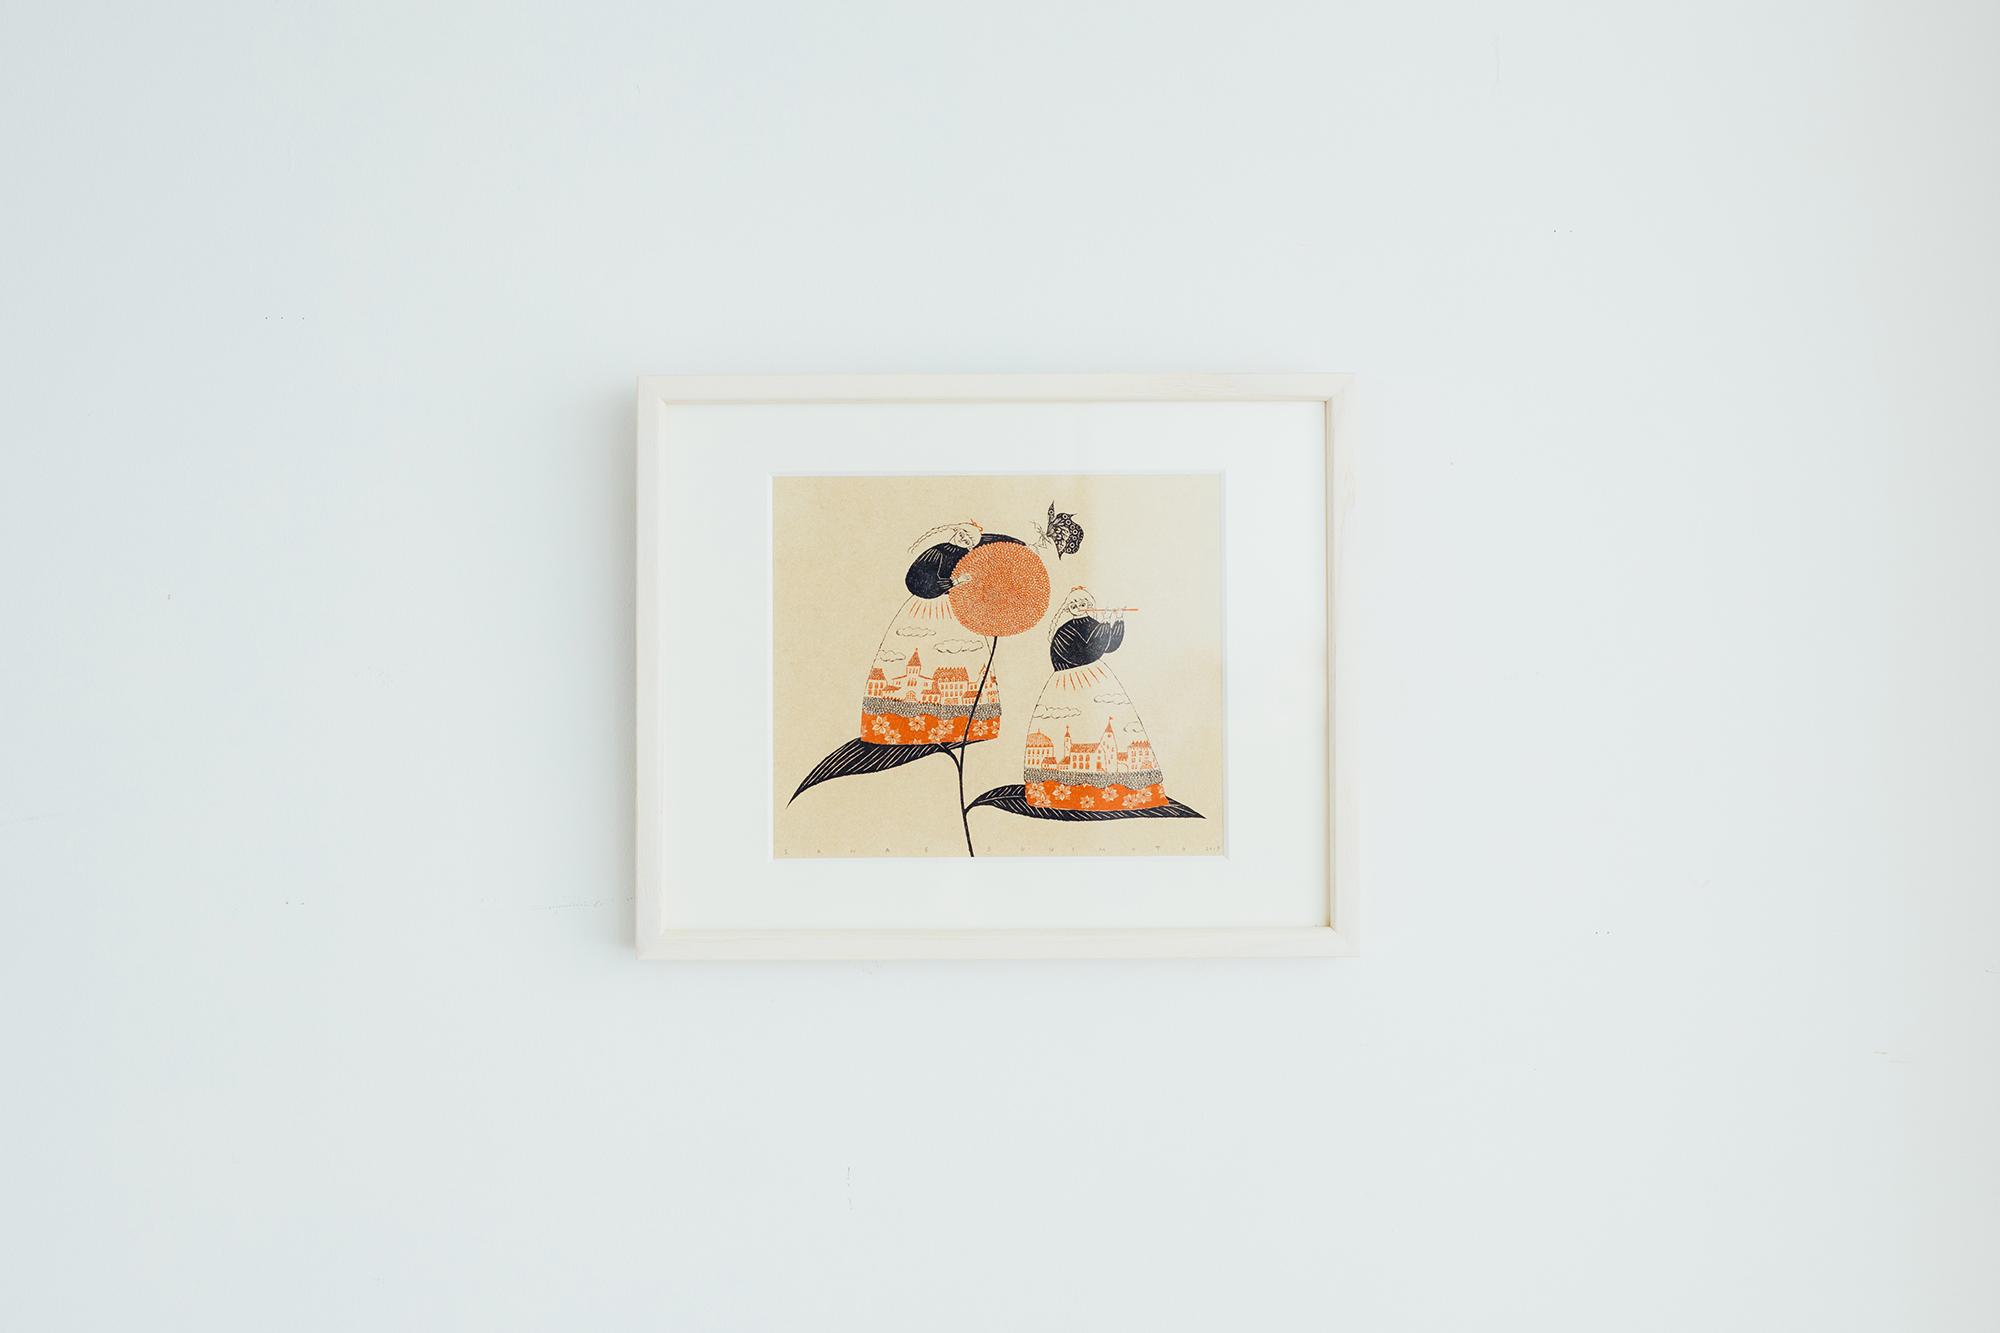 Sanae Sugimoto 「昼下がりの夢」